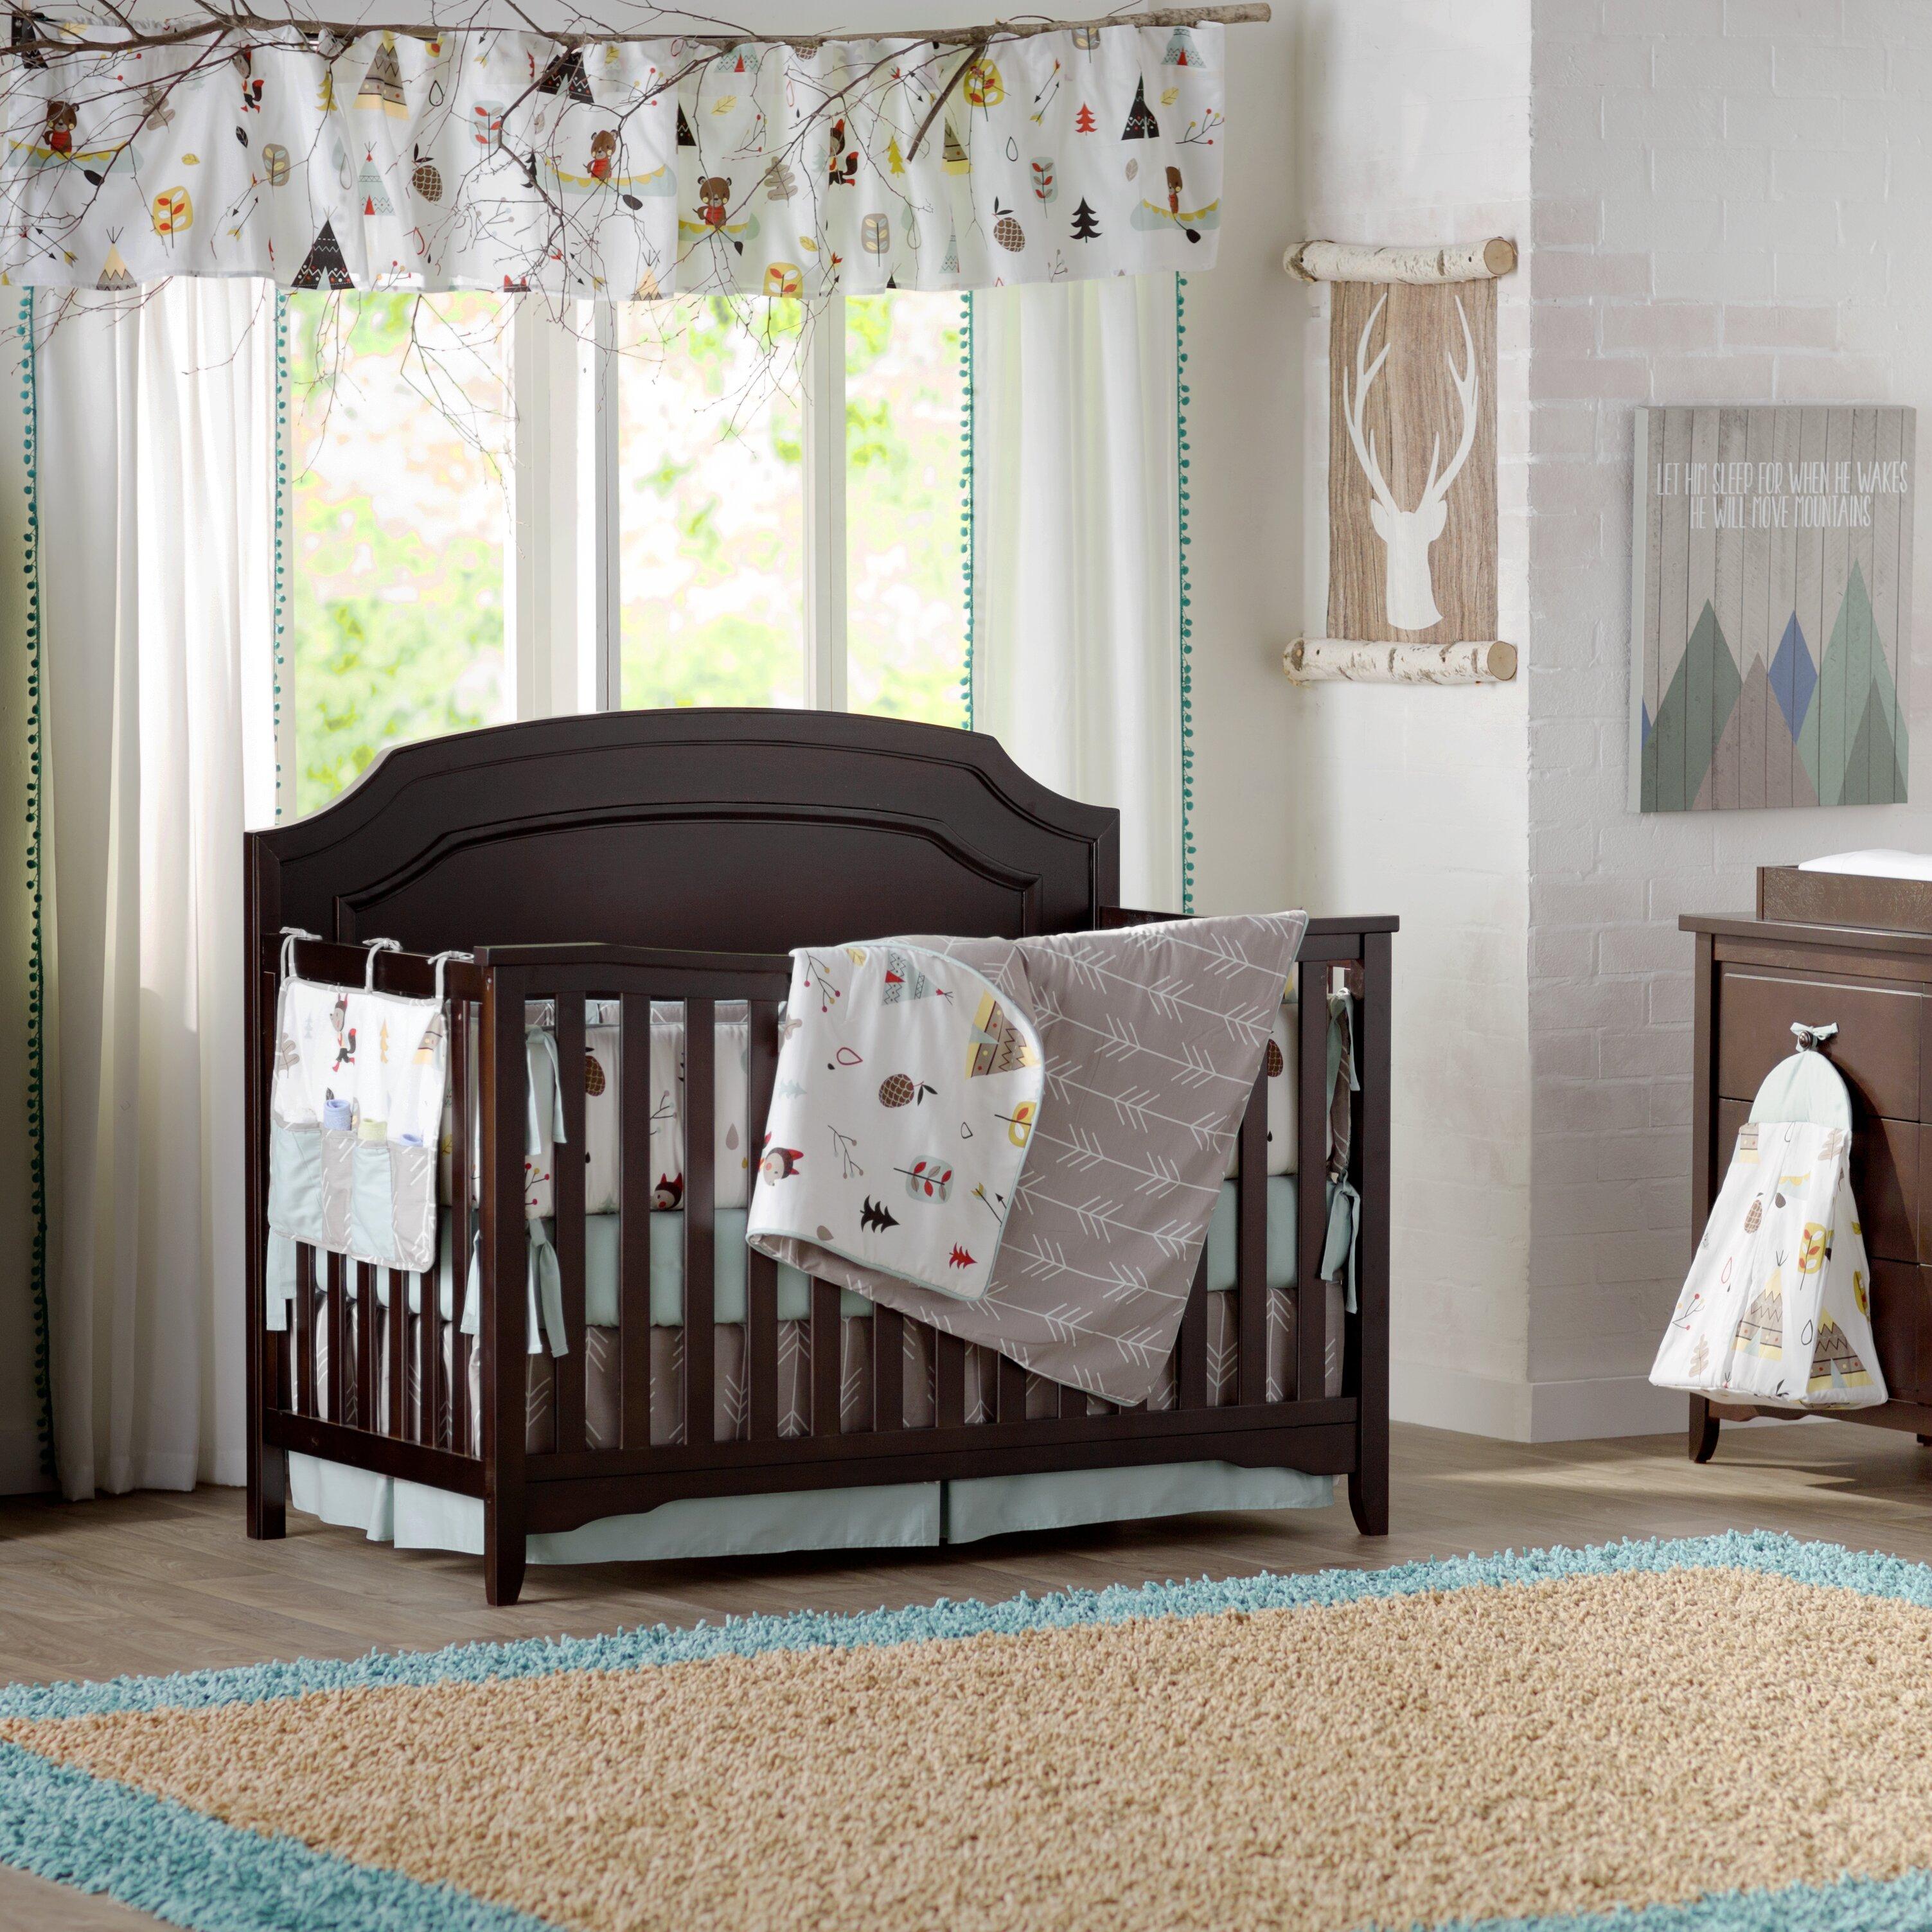 Baby cribs jacksonville fl - Viv Rae Trade Emma 4 In 1 Convertible Crib